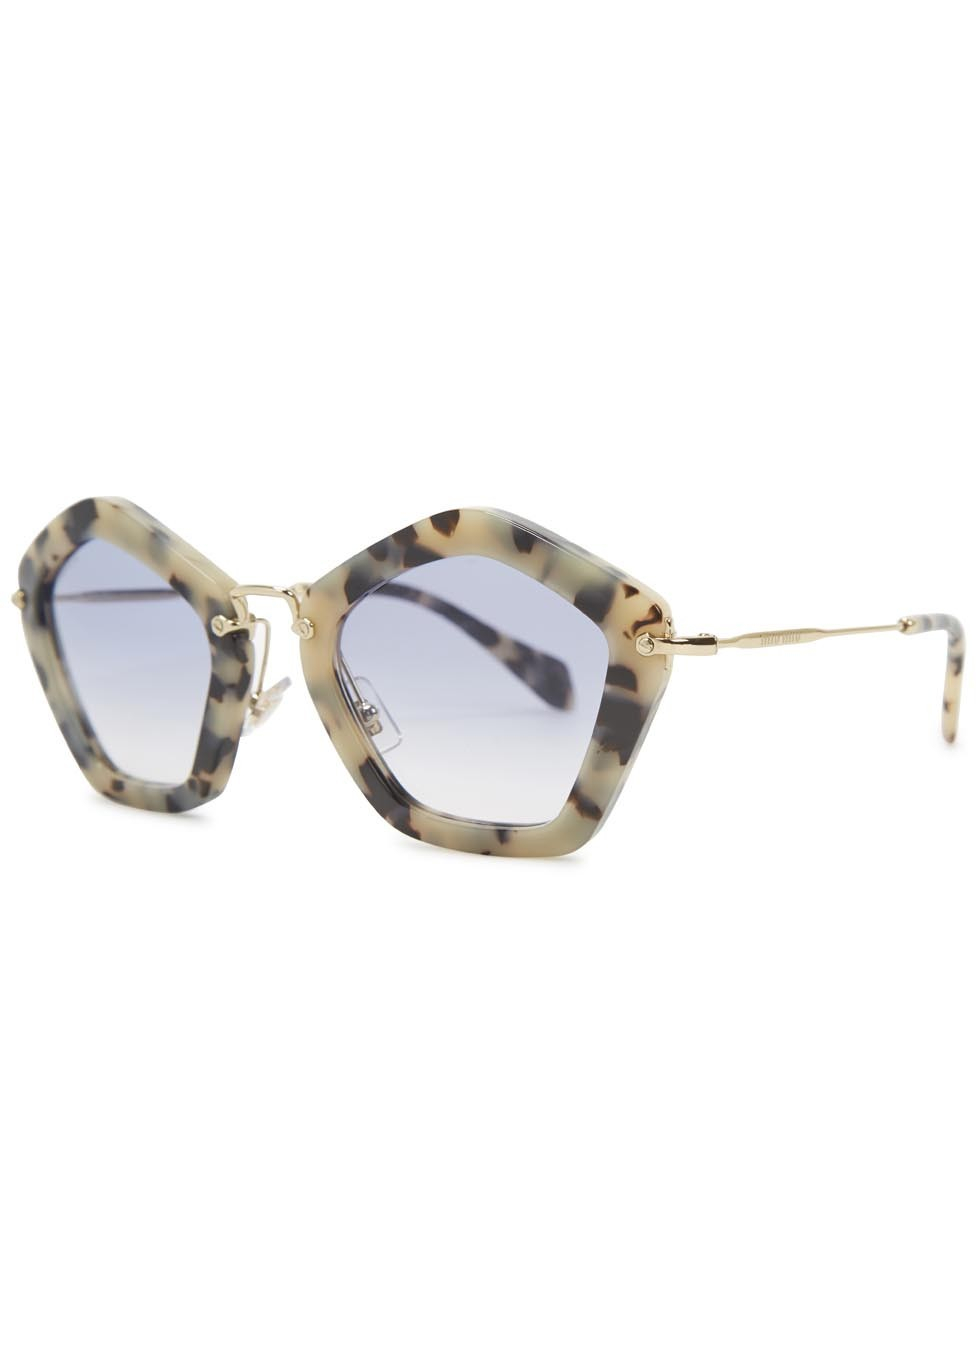 44c861d63fe Miu Miu Havana Pentagon Frame Sunglasses in Natural - Lyst